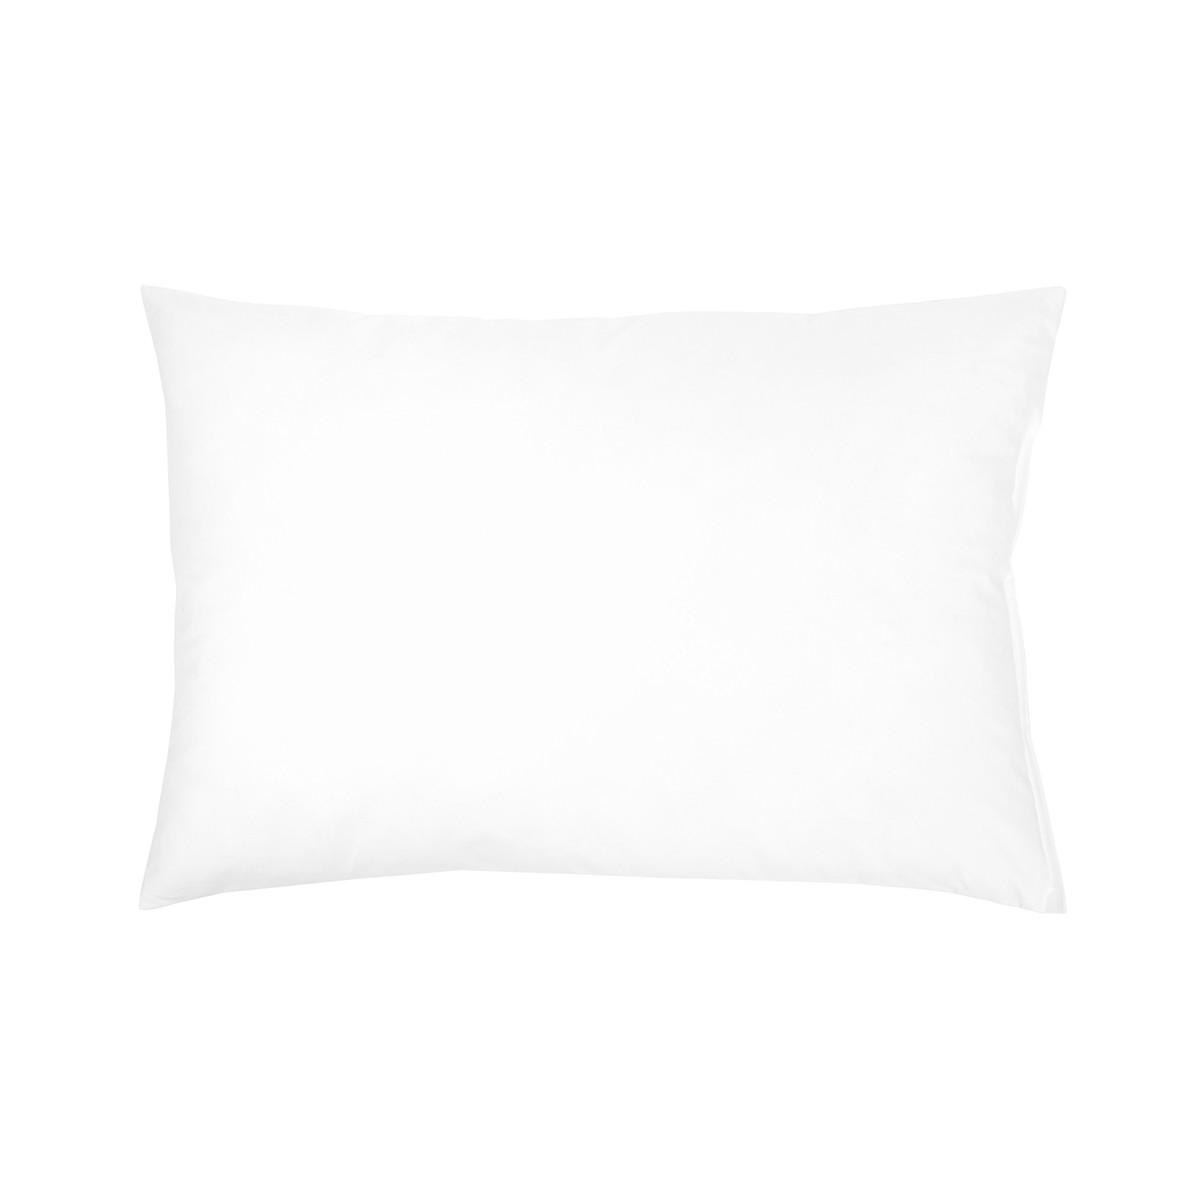 Garnissage rectangle 35 x 59 cm